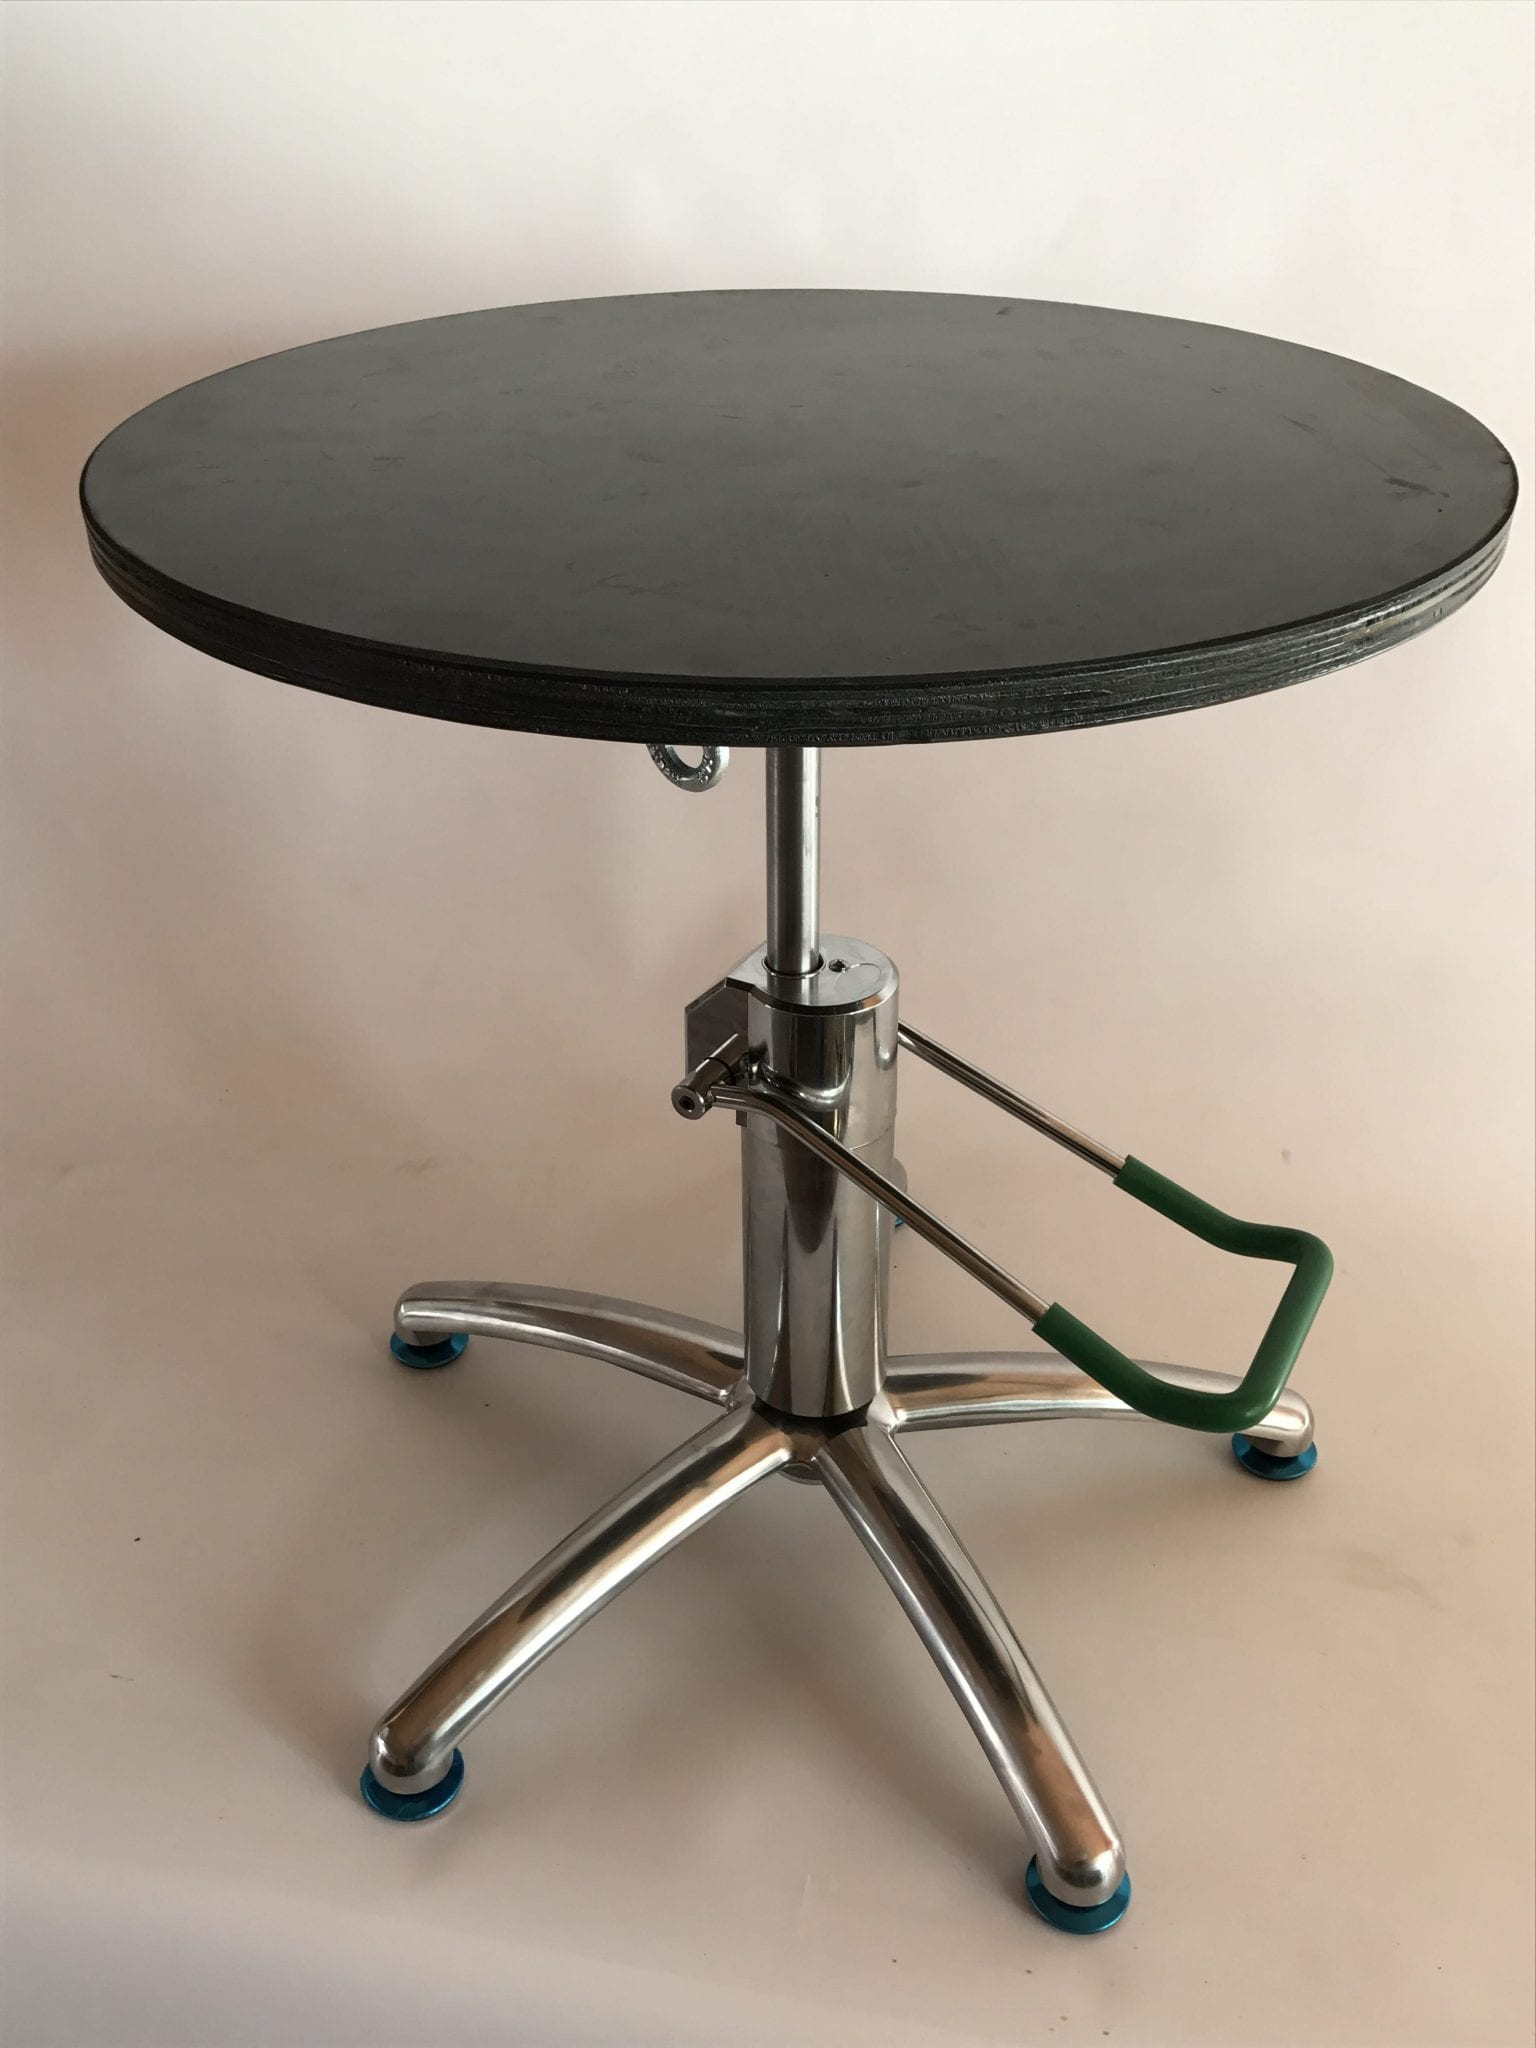 bonsaitable GreenT Basic   professional hydraulic lift bonsai turntable   Image of bonsaitable